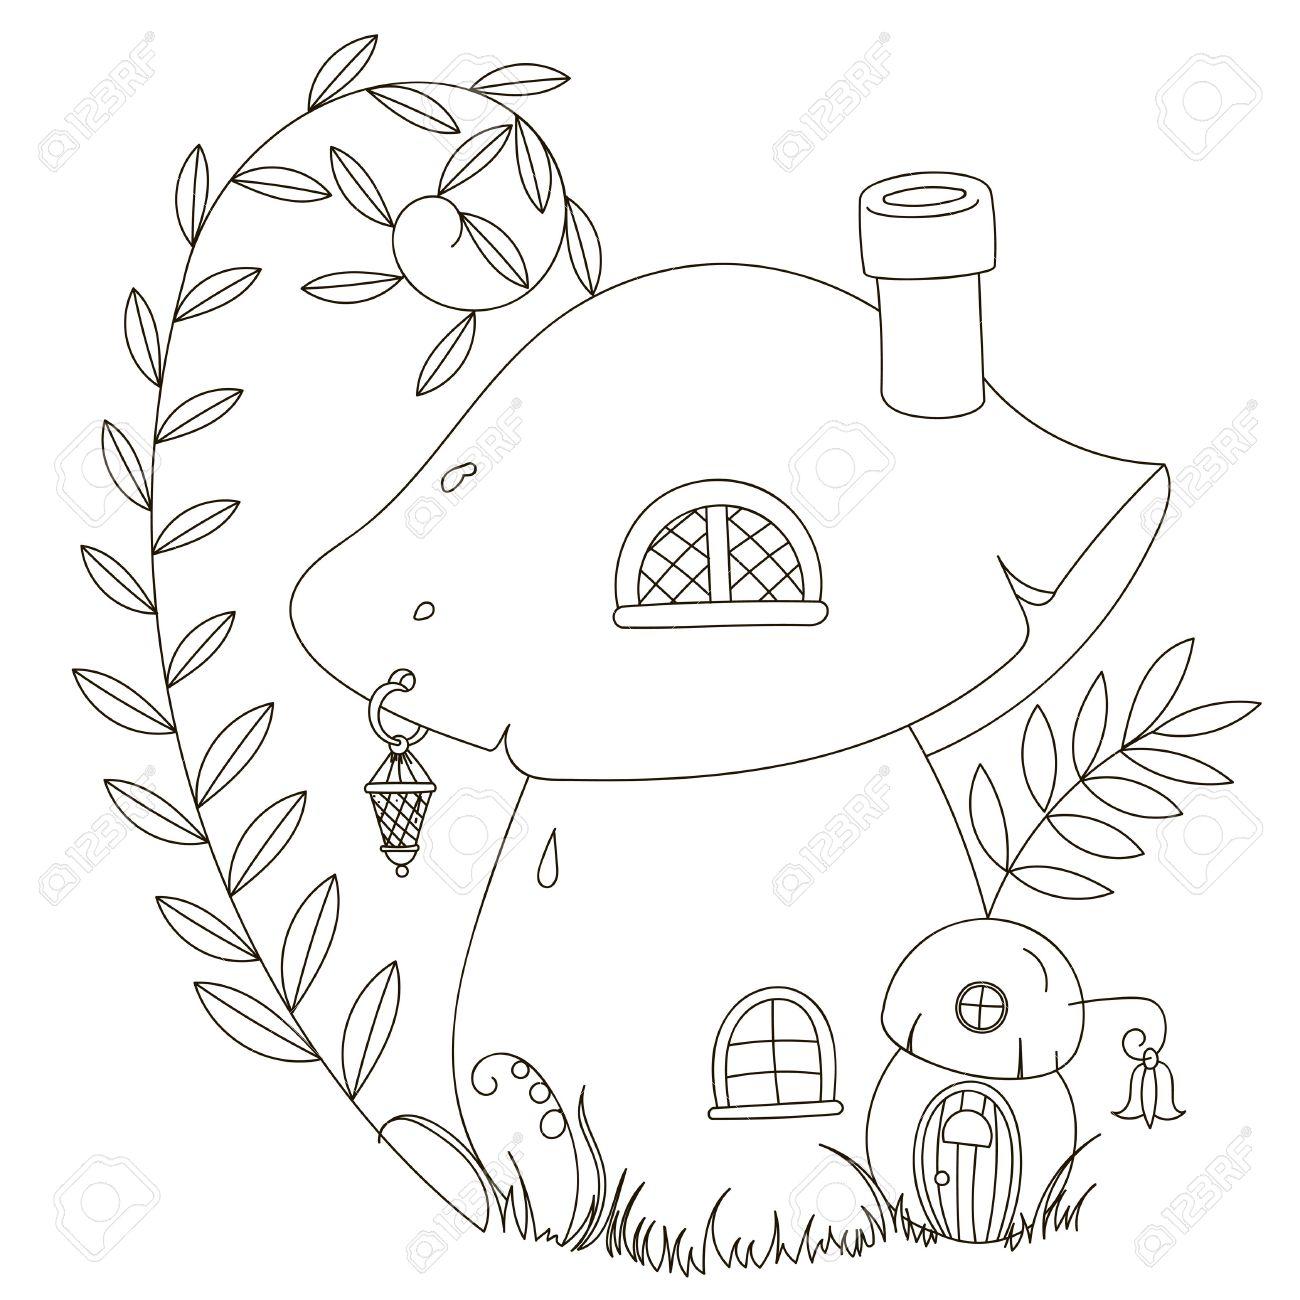 1300x1300 Fairy Cartoon Mushroom House. Coloring. Black Contour On A White